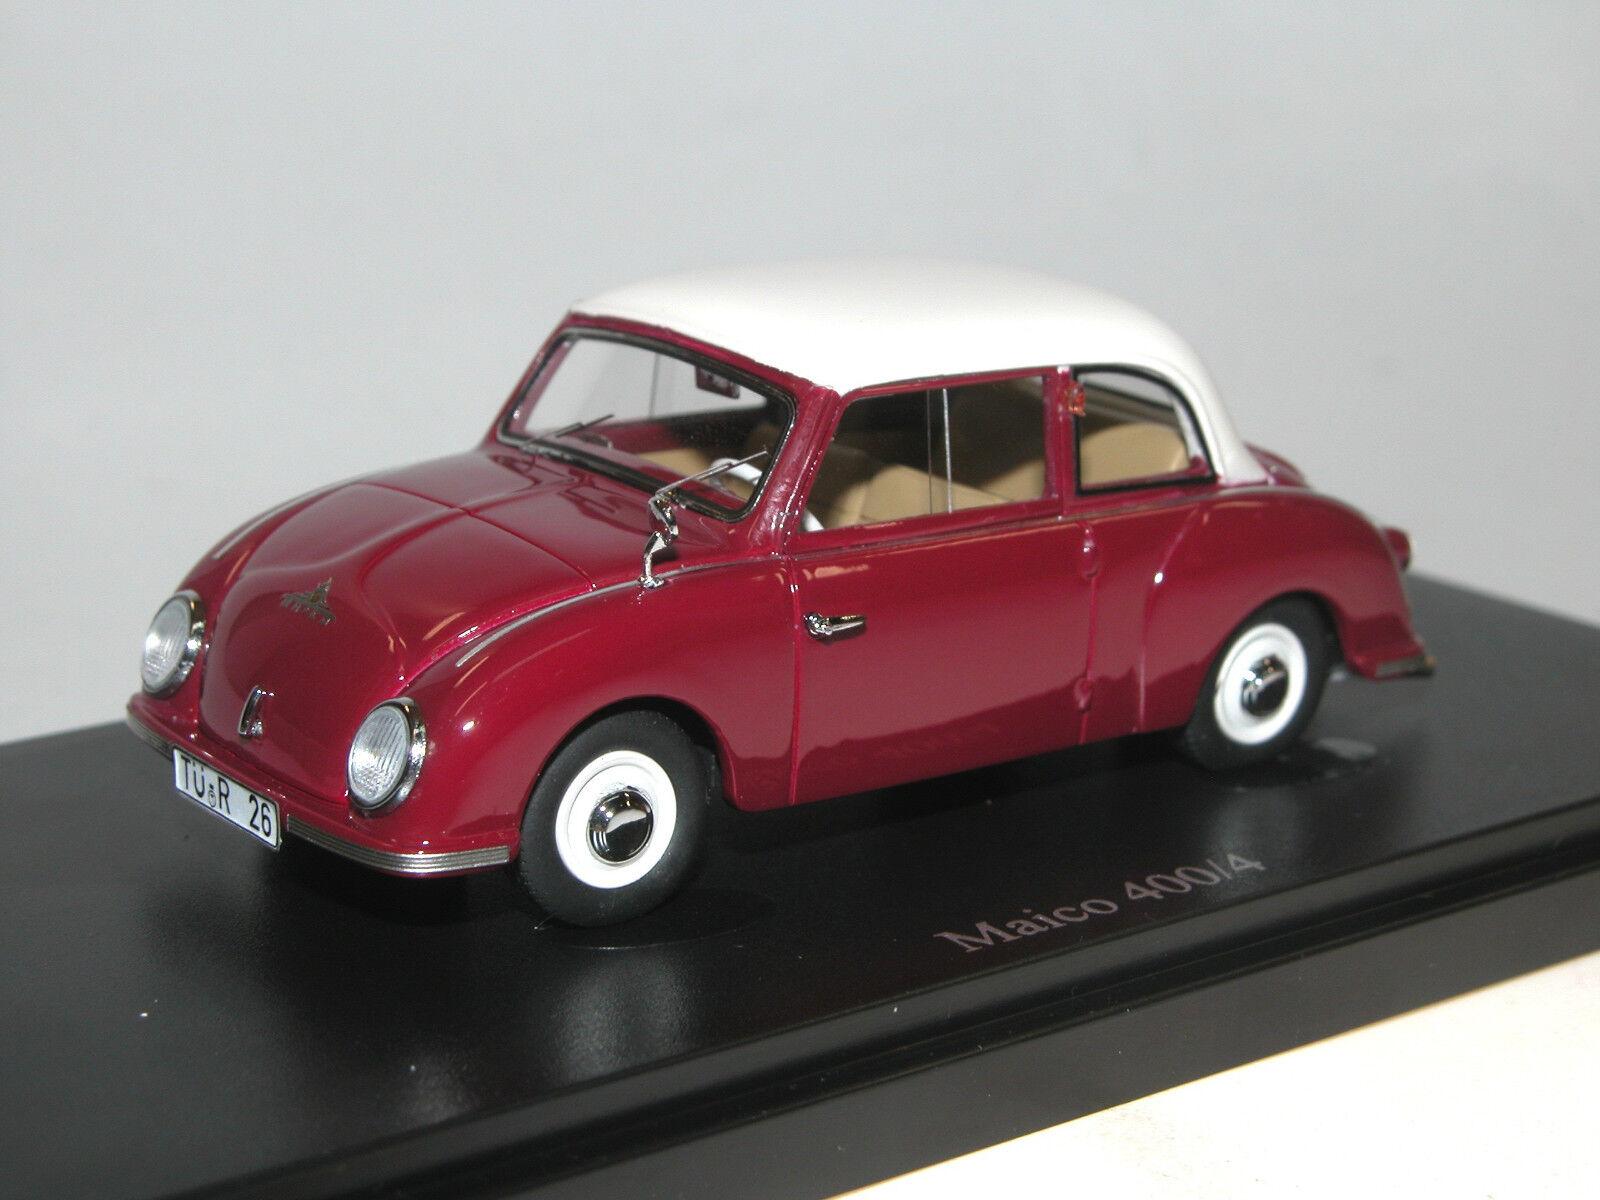 Autocult 03006, 1955 400 4 Maico, micro car, Bubble car, Limited Edition 1 43